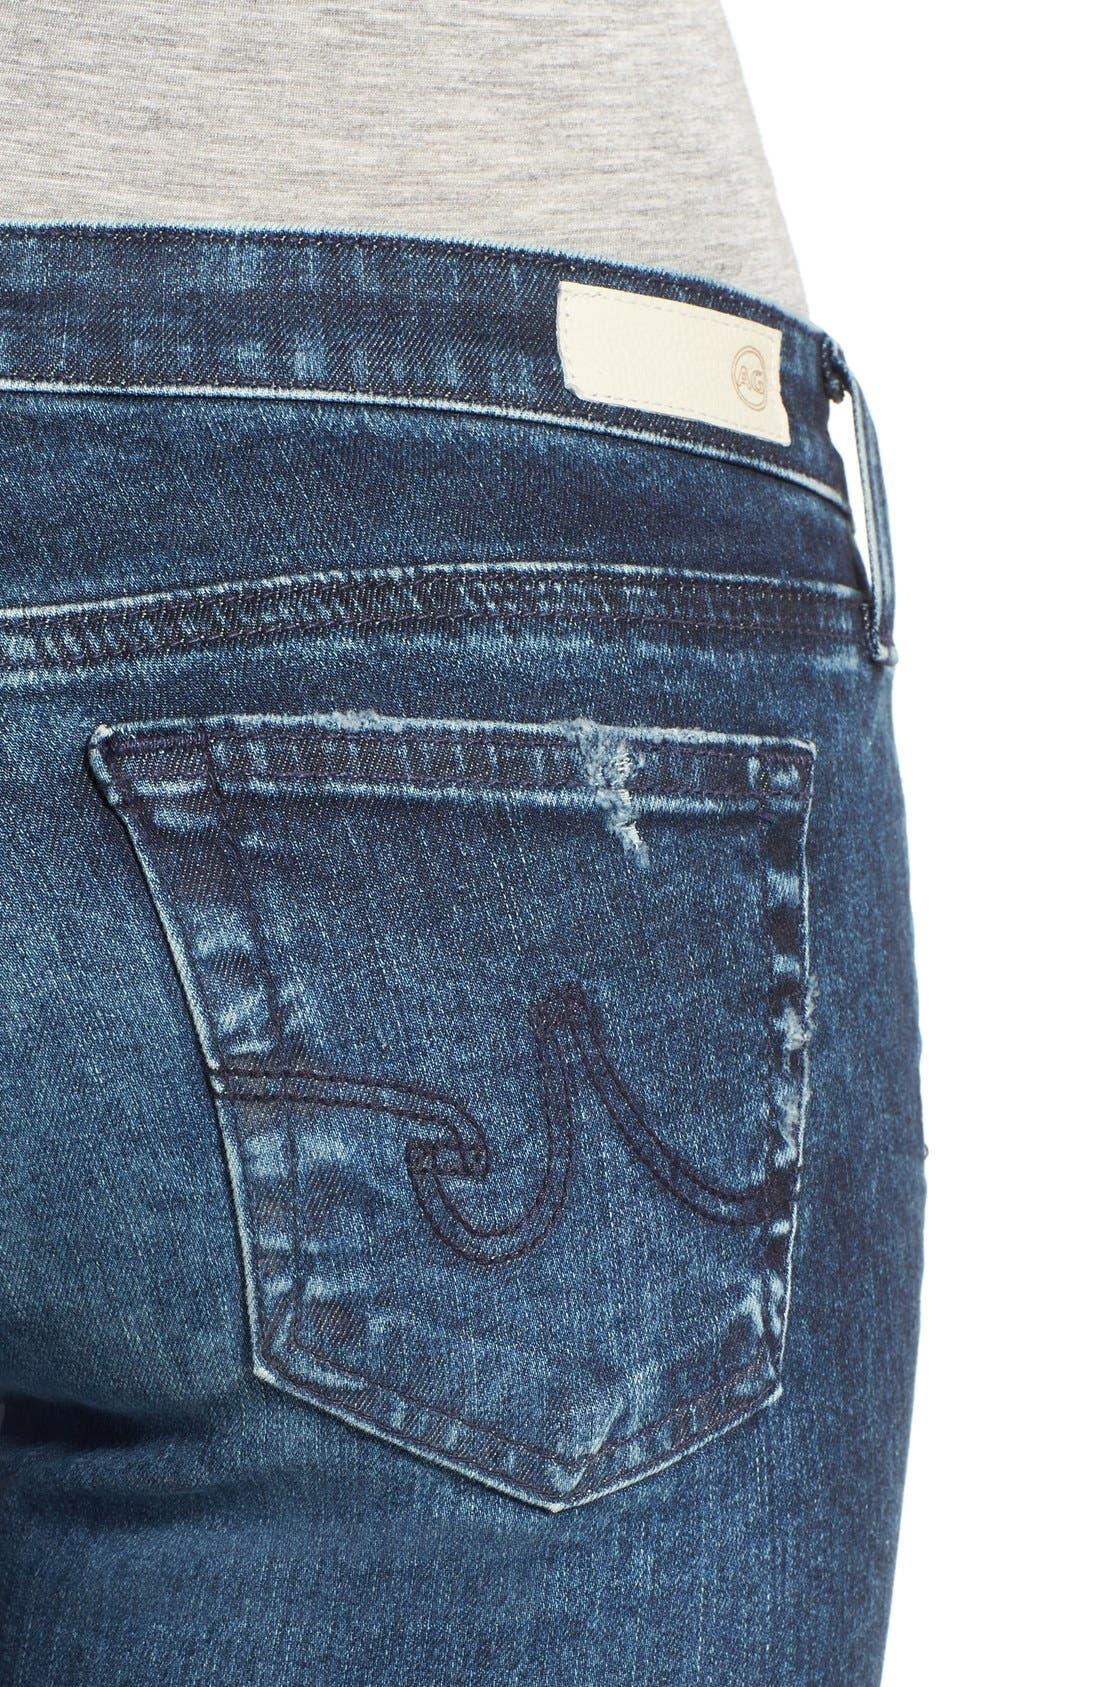 'The Legging' Ankle Super Skinny Jeans,                             Alternate thumbnail 4, color,                             407